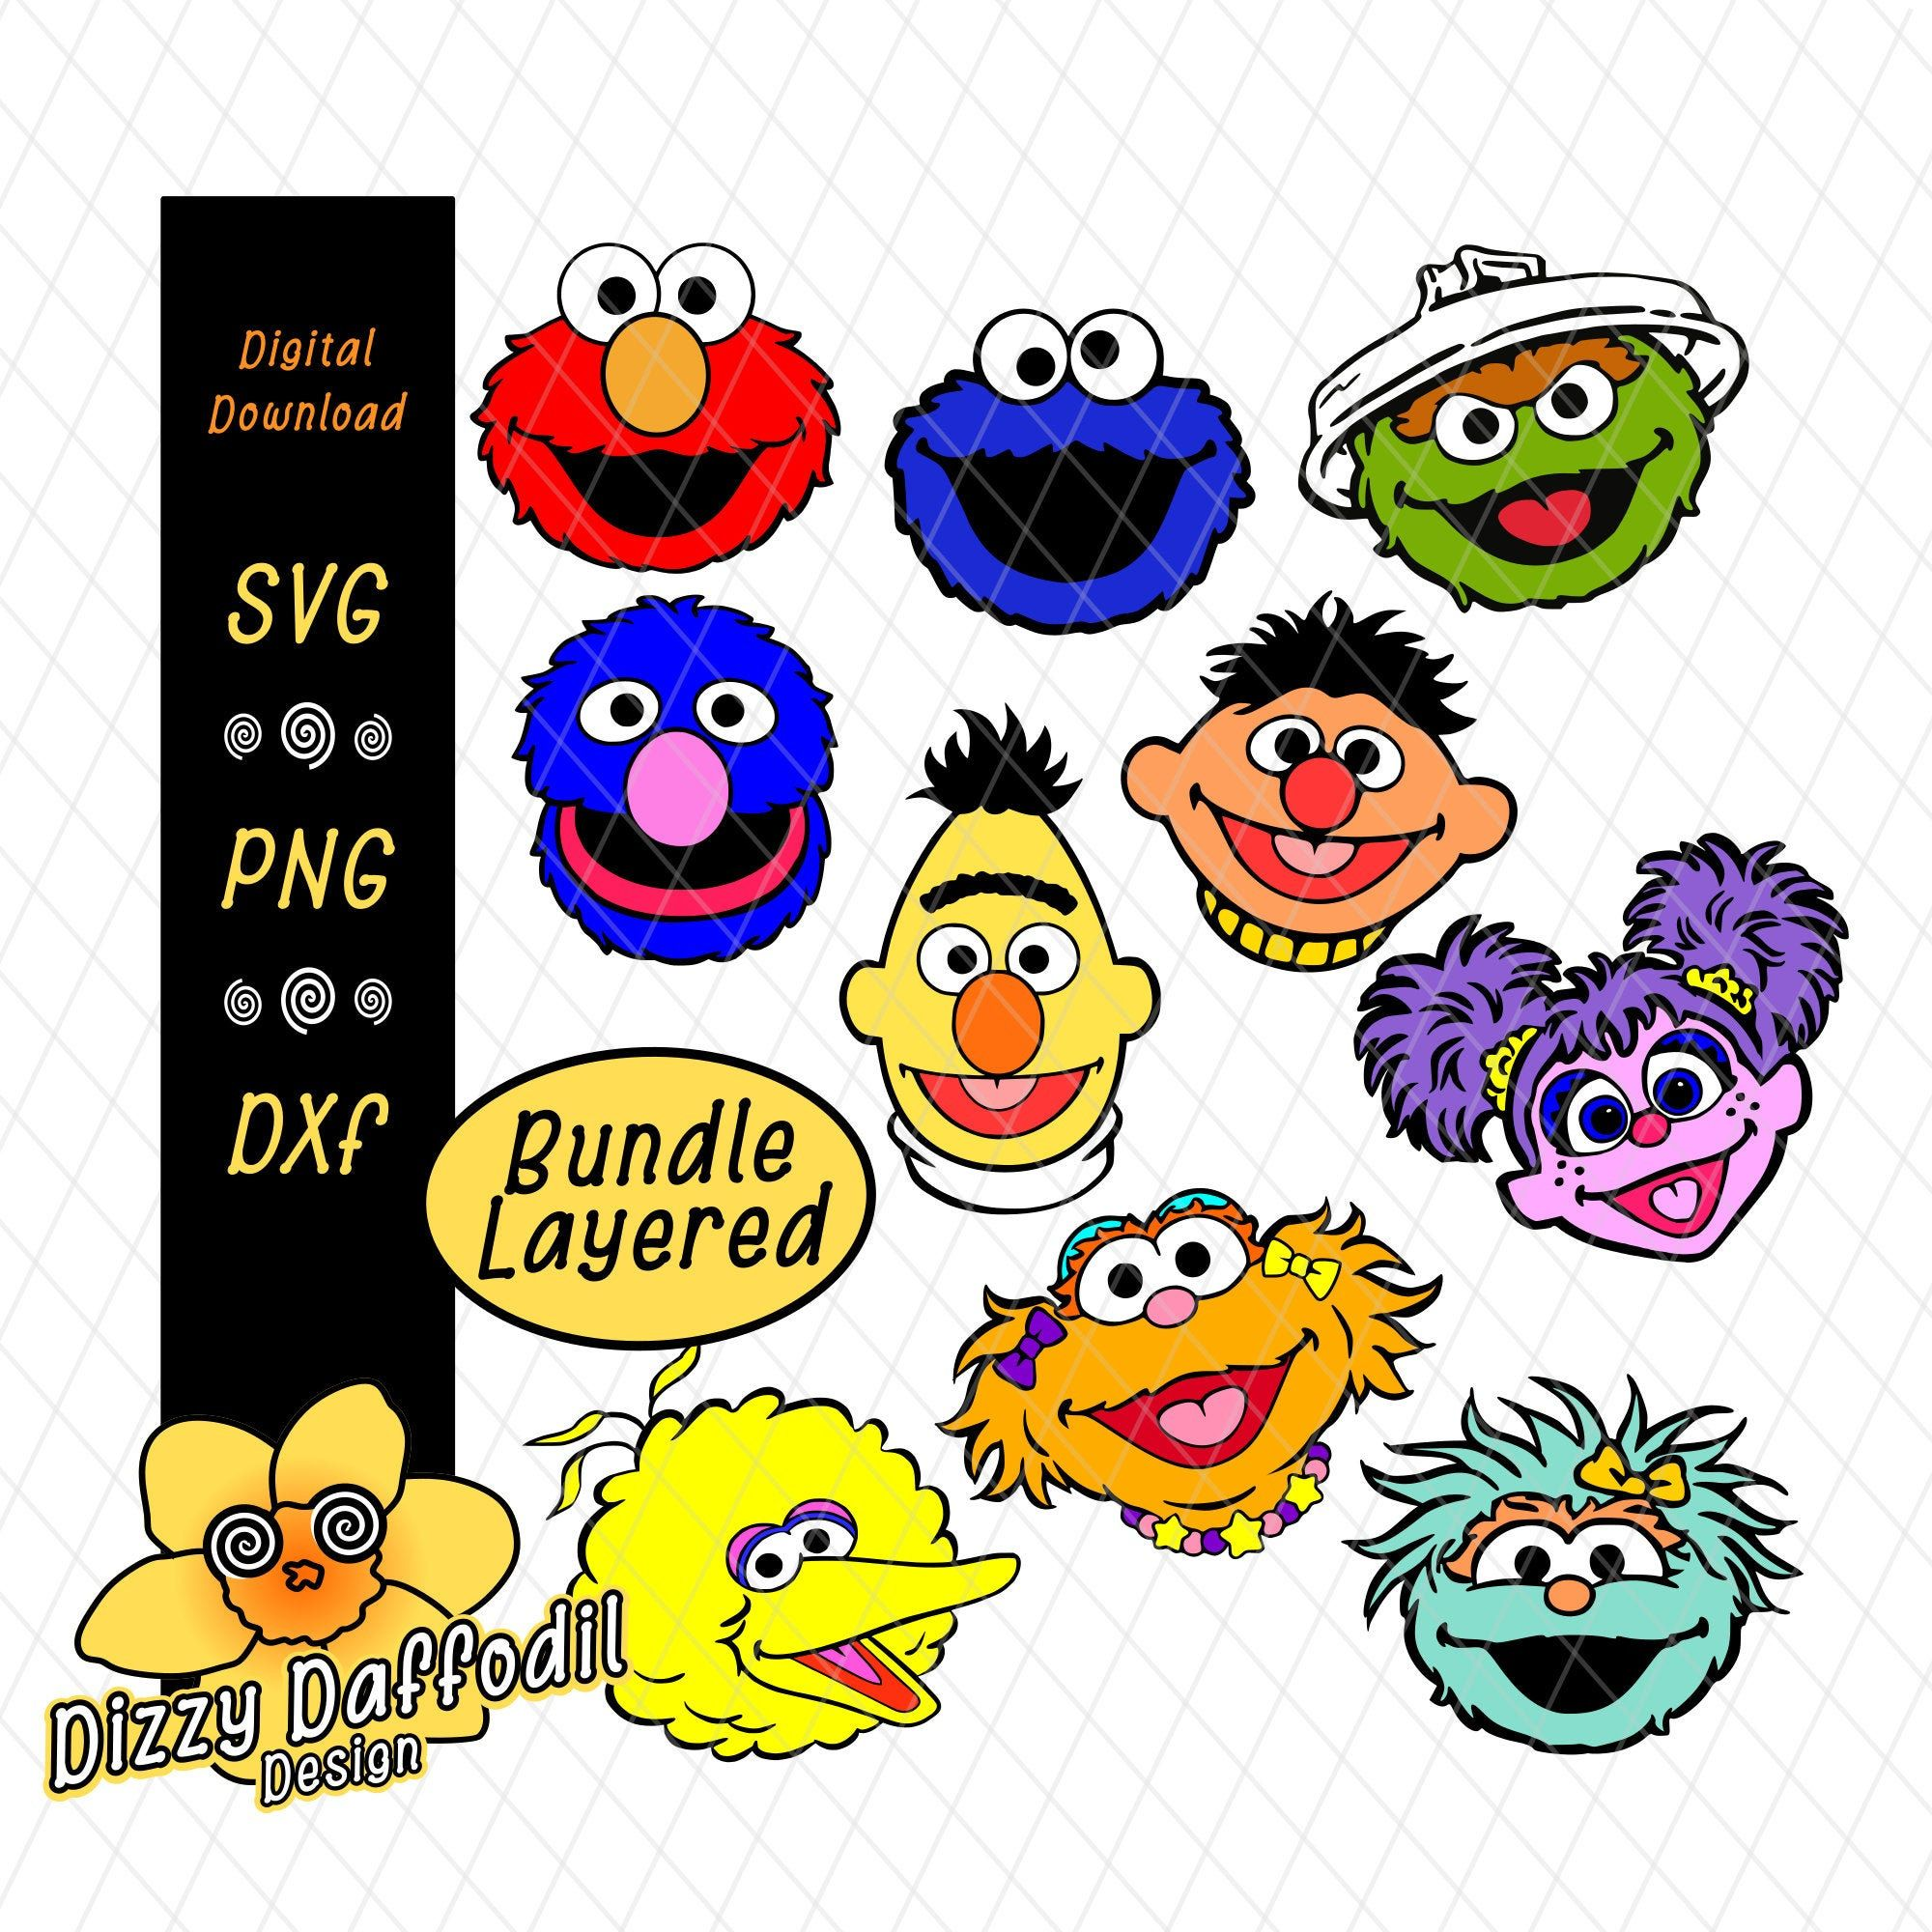 Sesame Street Face Head Bundle Svg Dxf Sesame Street Layered Design Digital Download Elmo Cookie M Digital Collage Sheets Sesame Street Selling Handmade Items